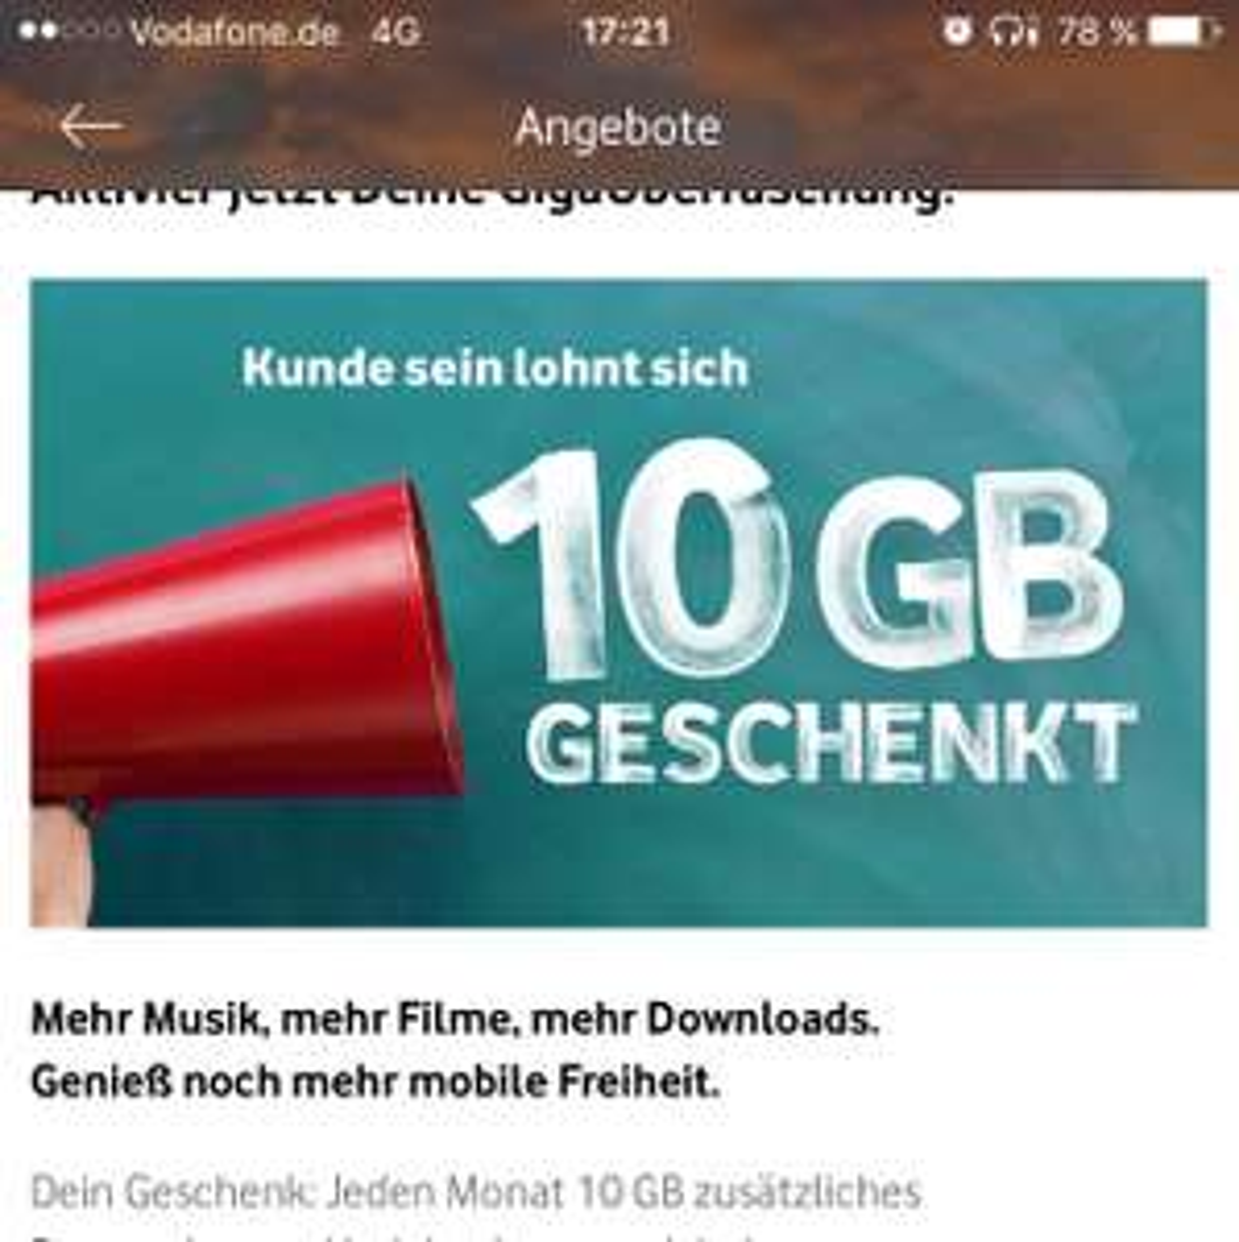 Vodafone junge Bestandskunden (u27): 10 GB jeden Monat umsonst